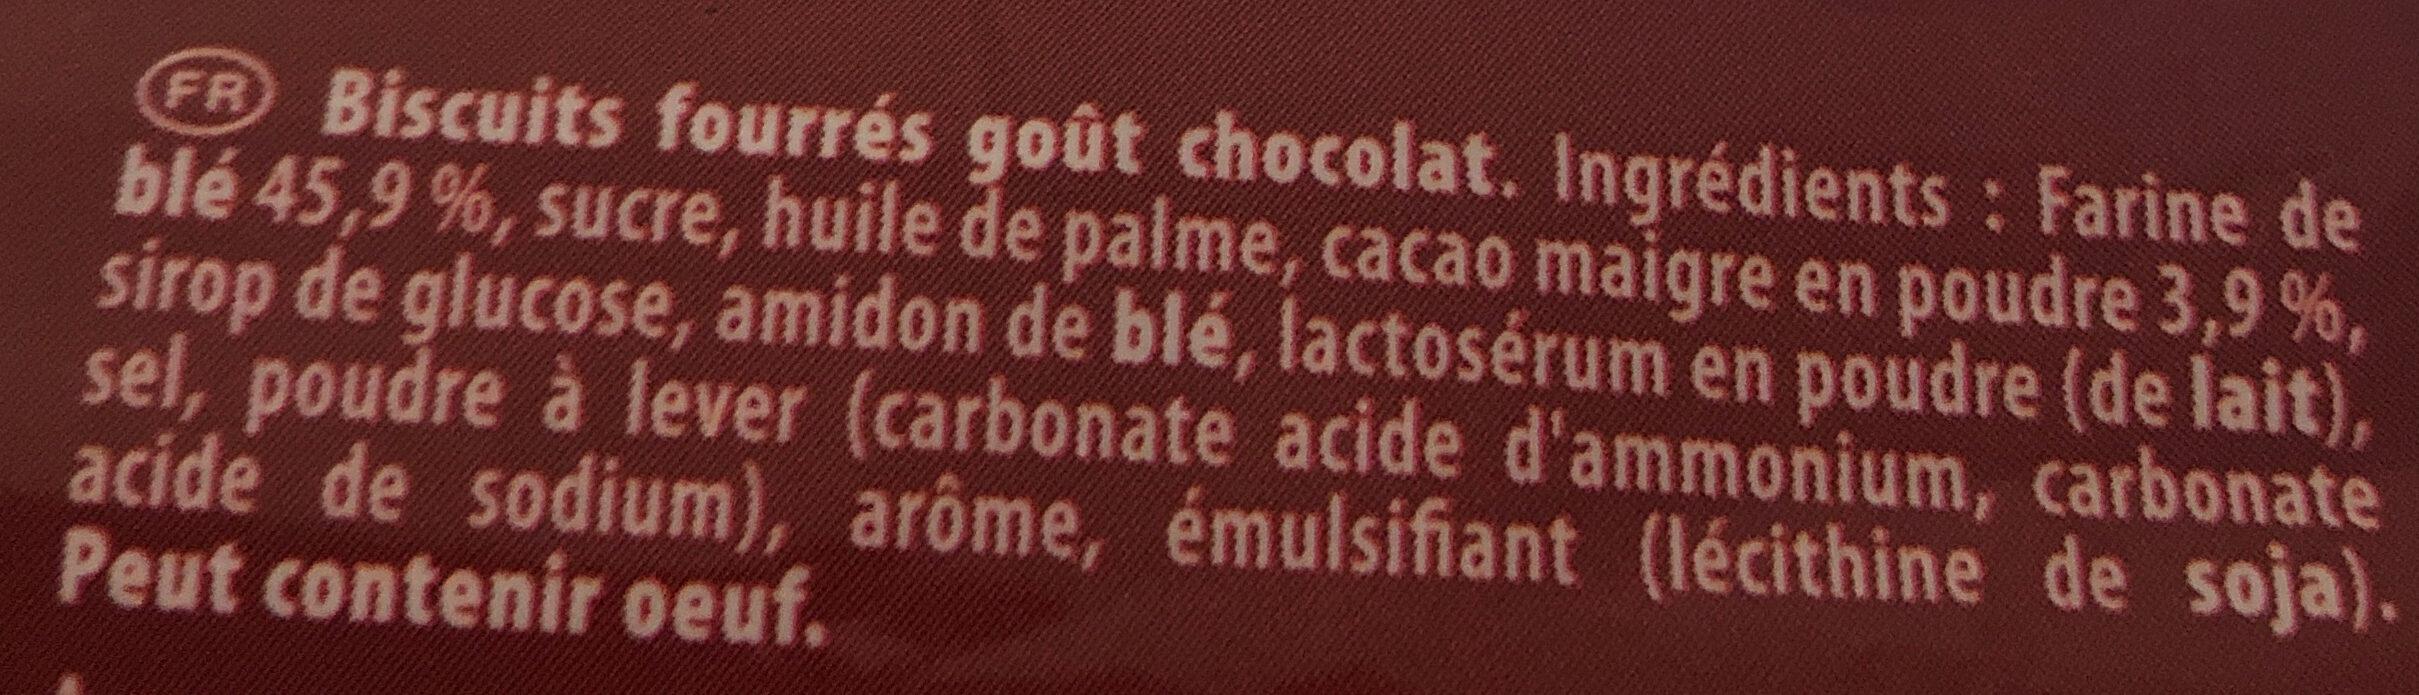 Pépito - Ingredients